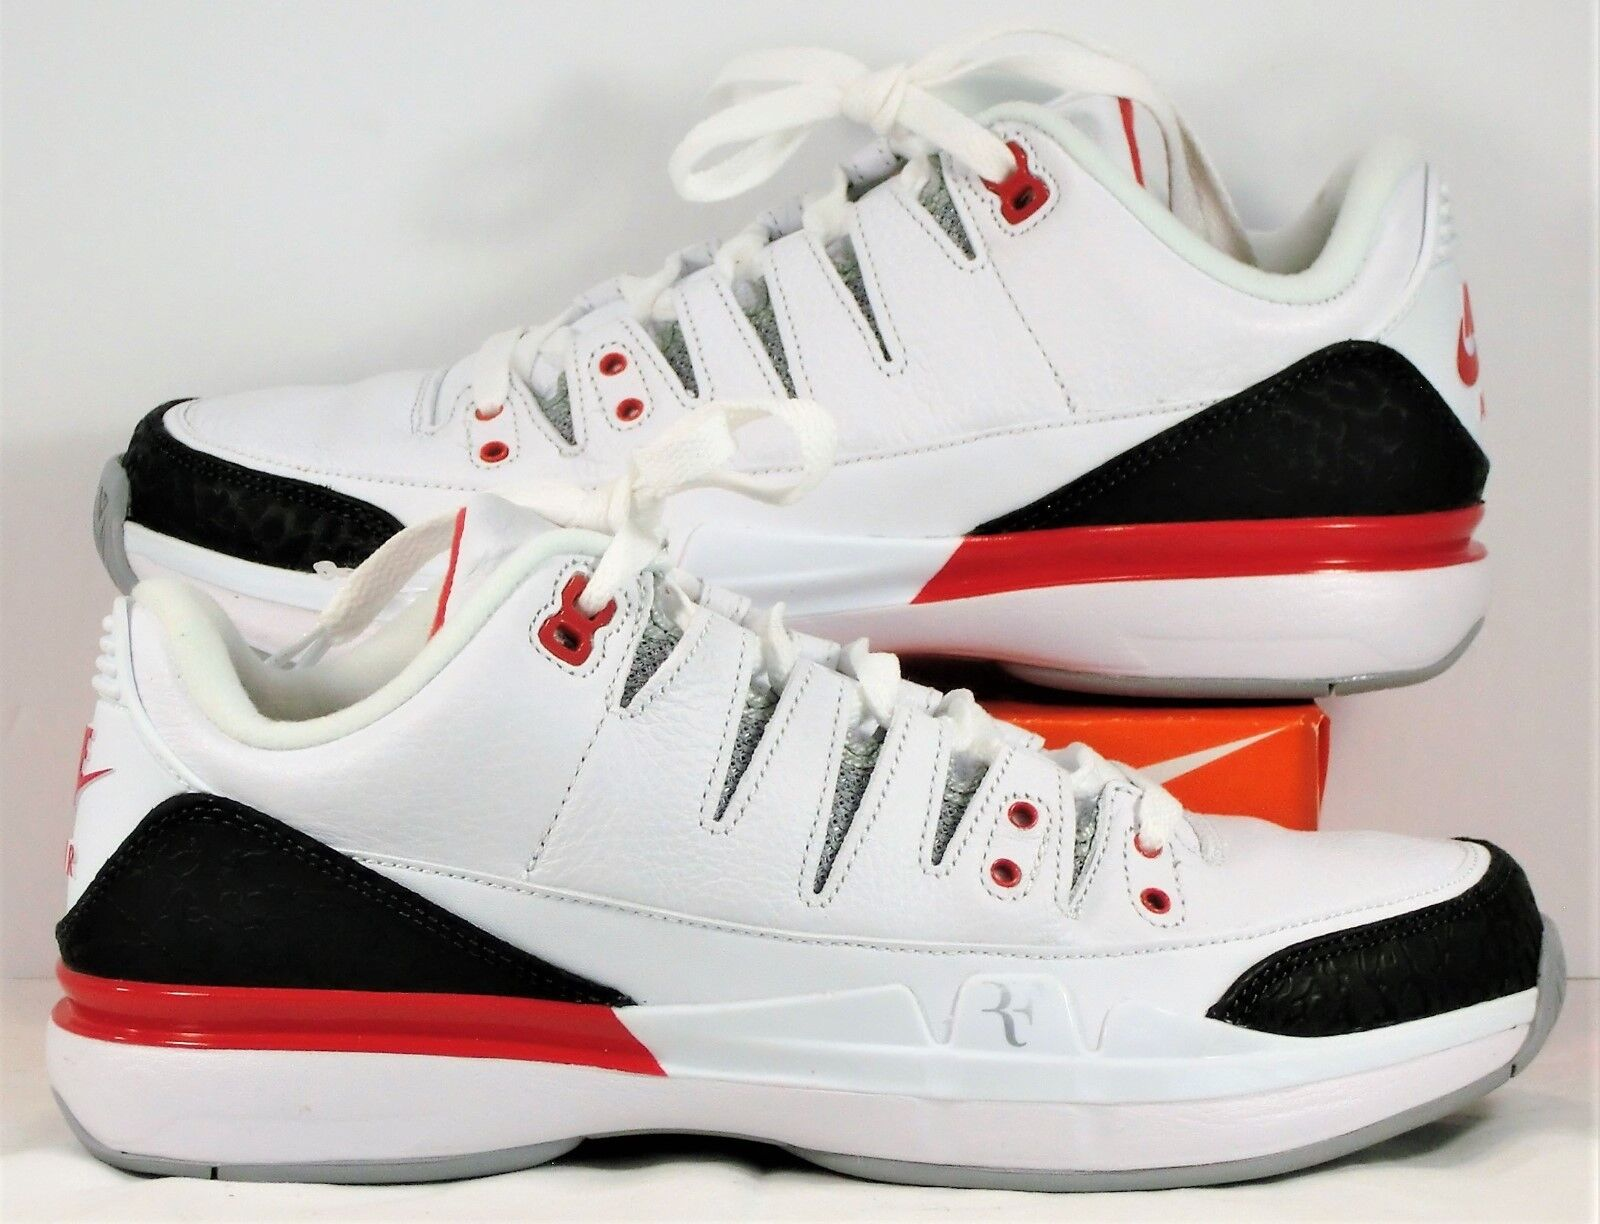 Nike Zoom Vapor RF X AJ3 Roger Federer Red Tennis Shoe Sz 4.5 NEW 709998 106